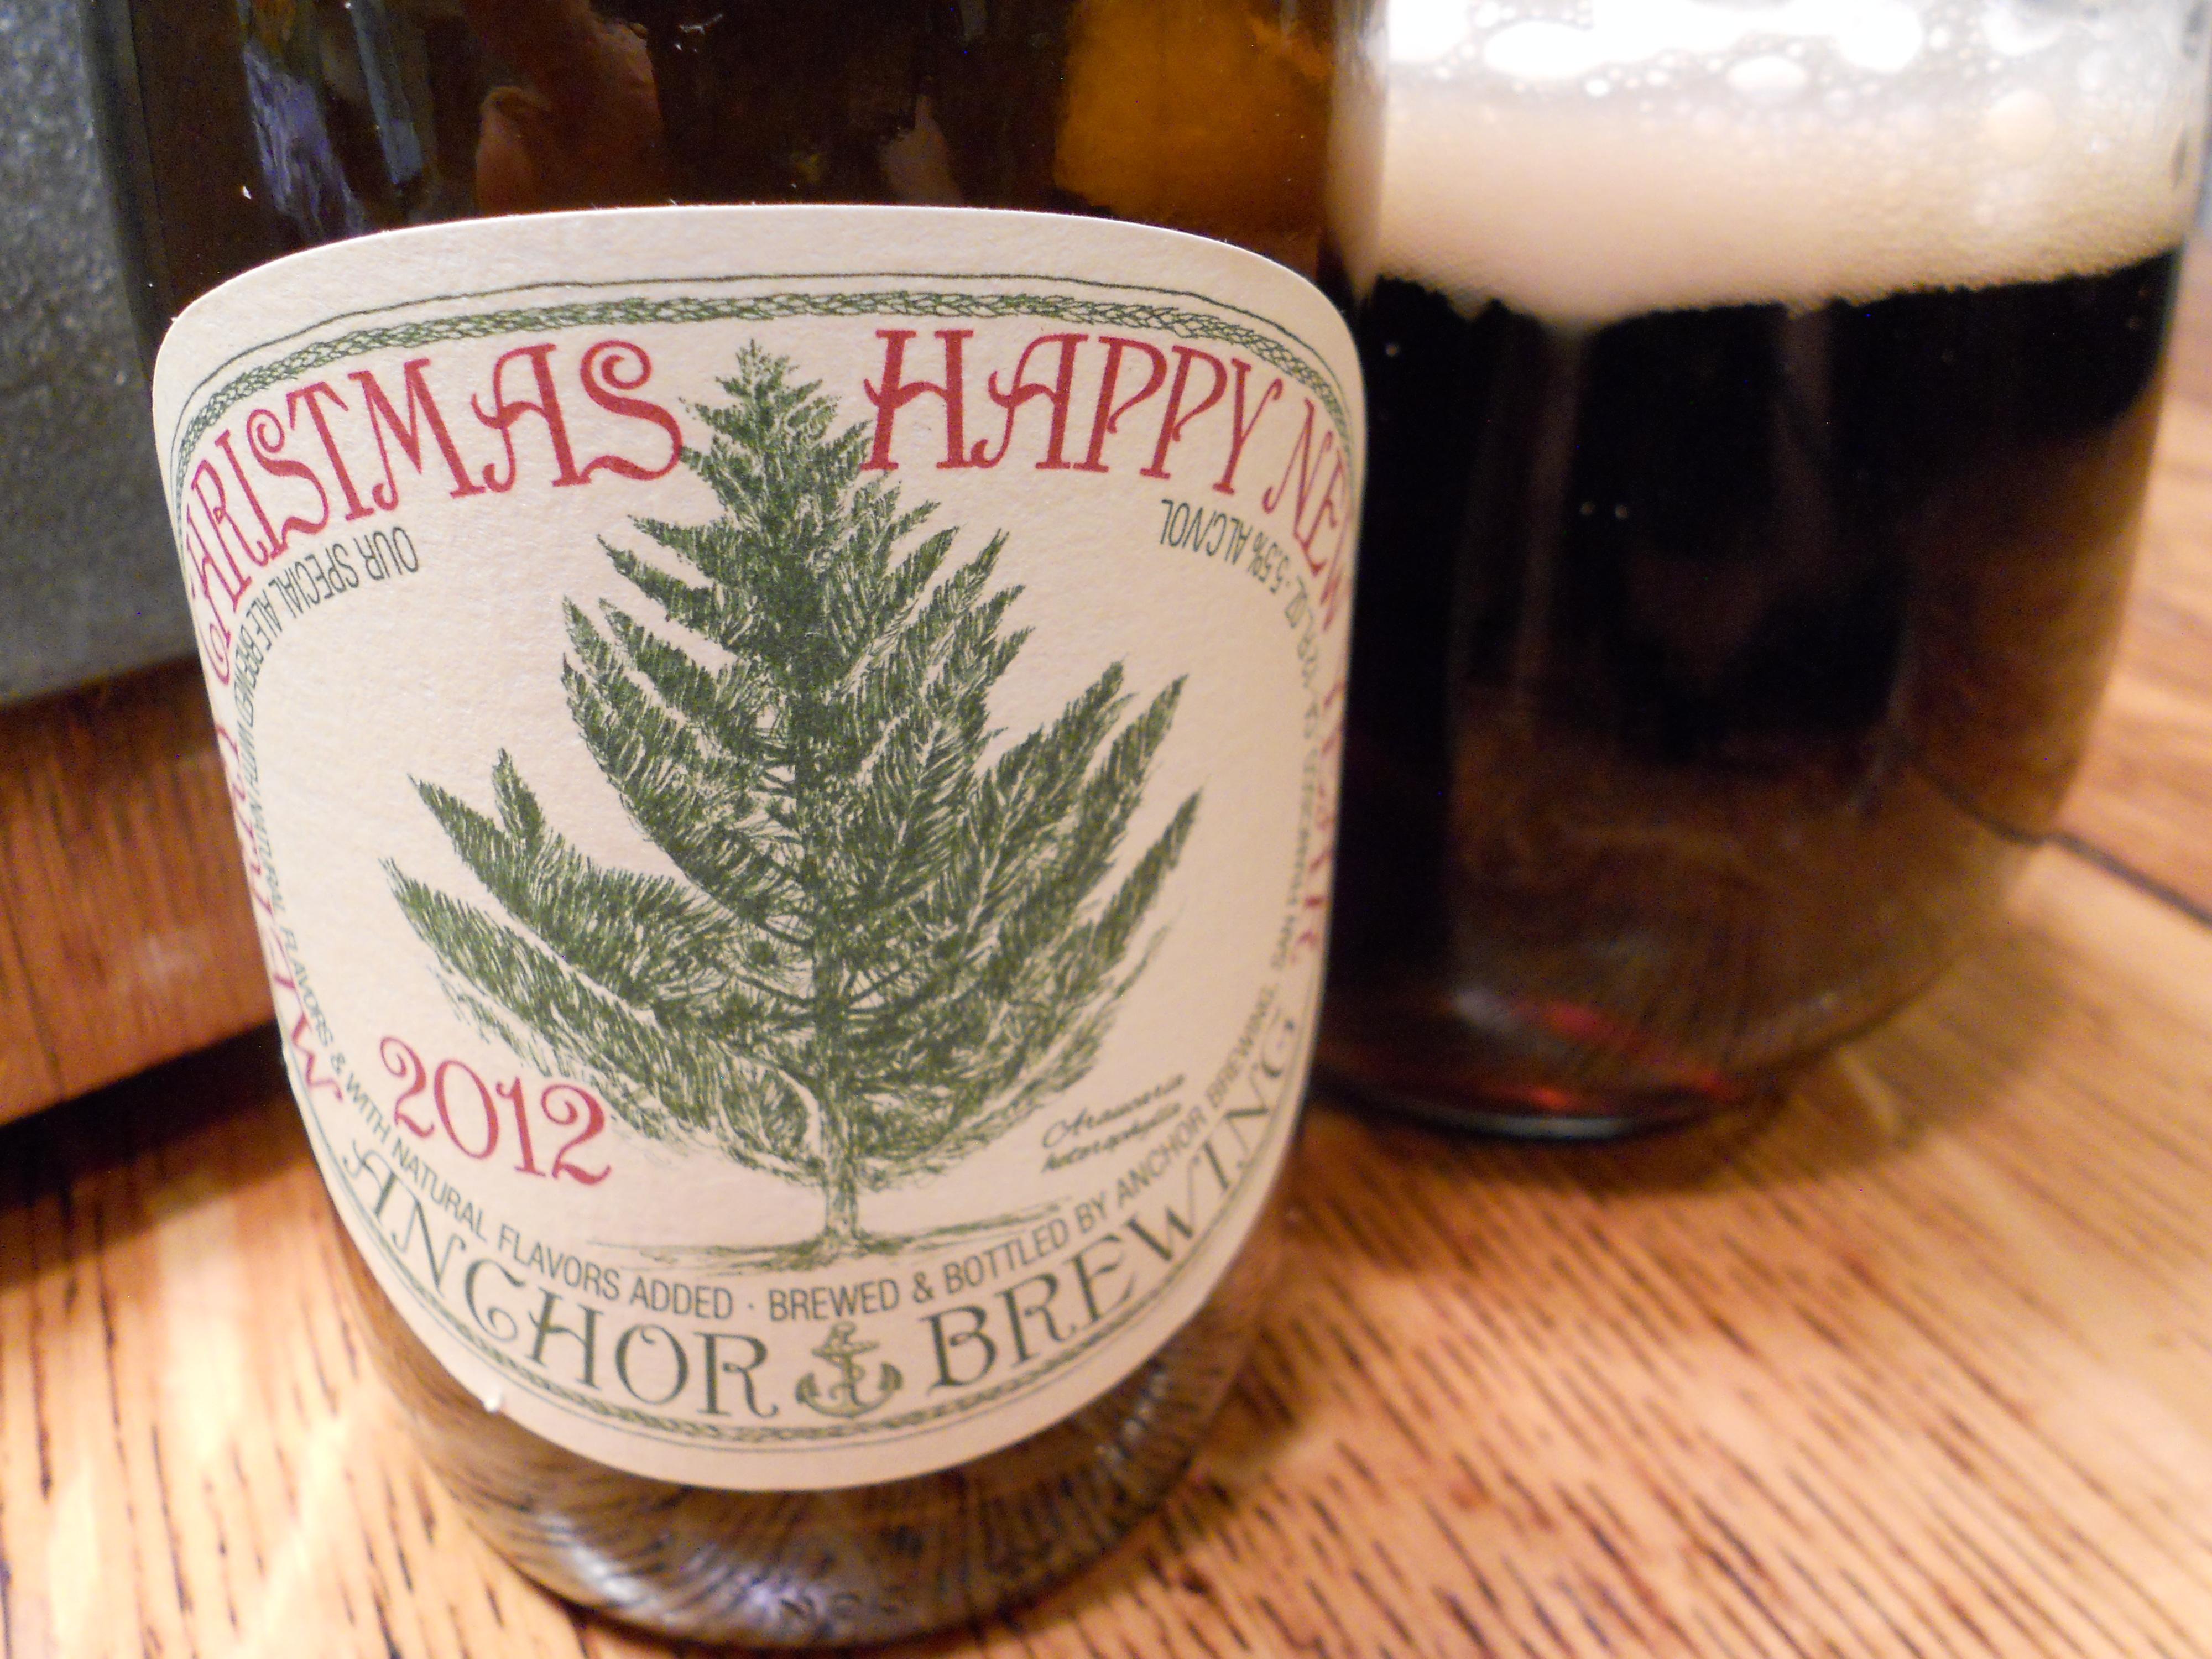 Christmas Beer | Tilting Suds